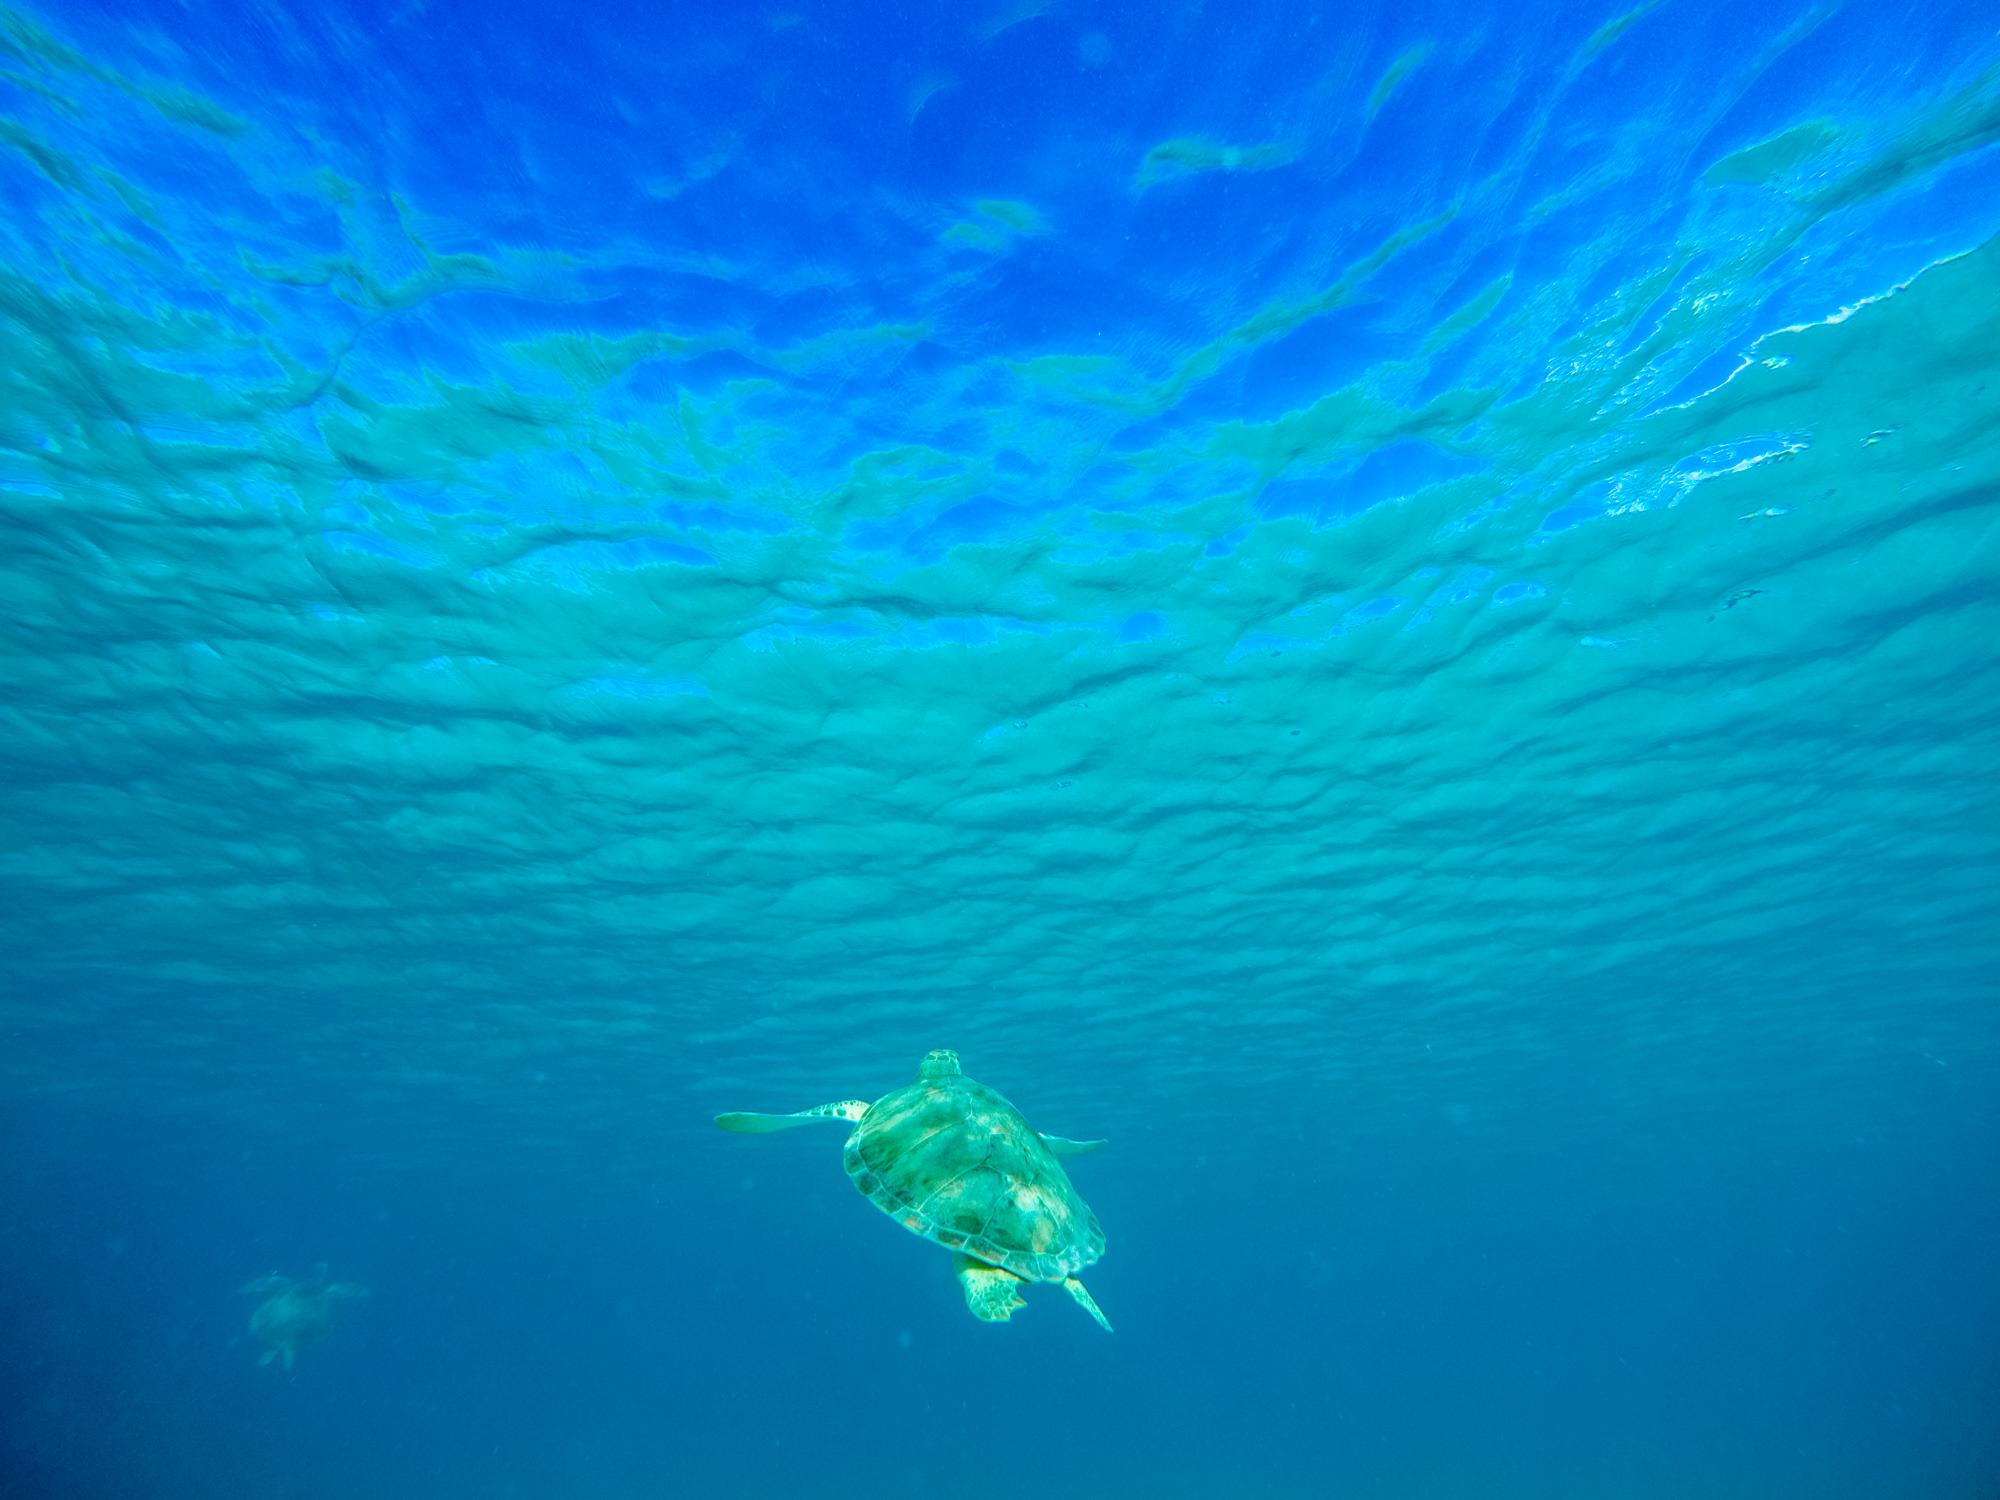 Sea Turtles were abundant at Scott Beach in Caneel Bay.